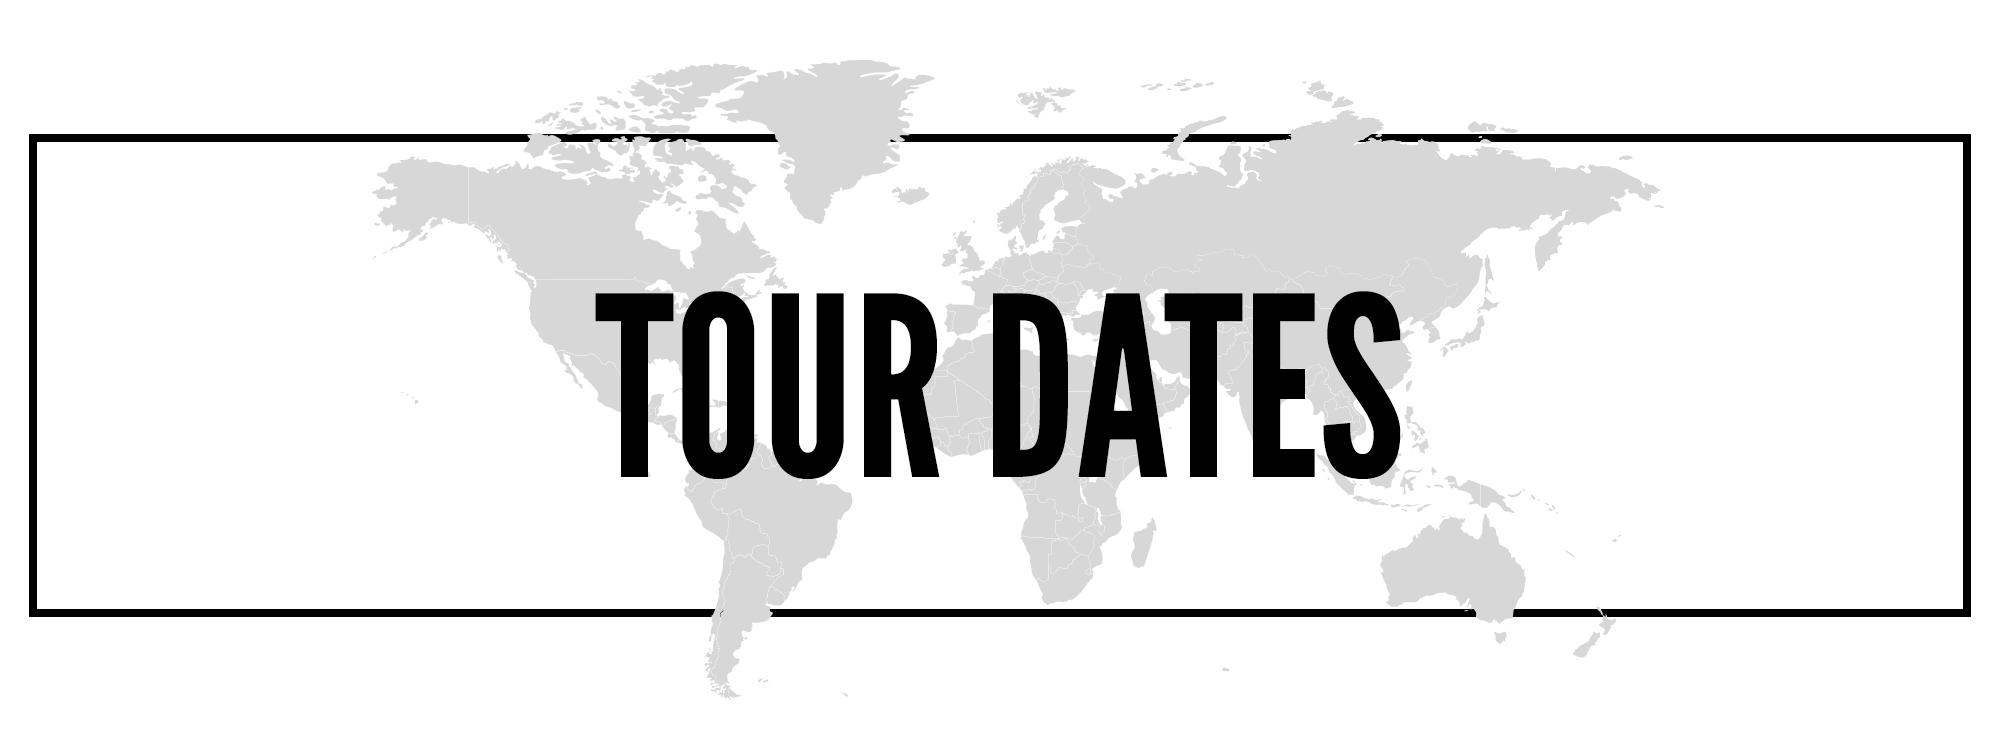 Tour Dates.jpg